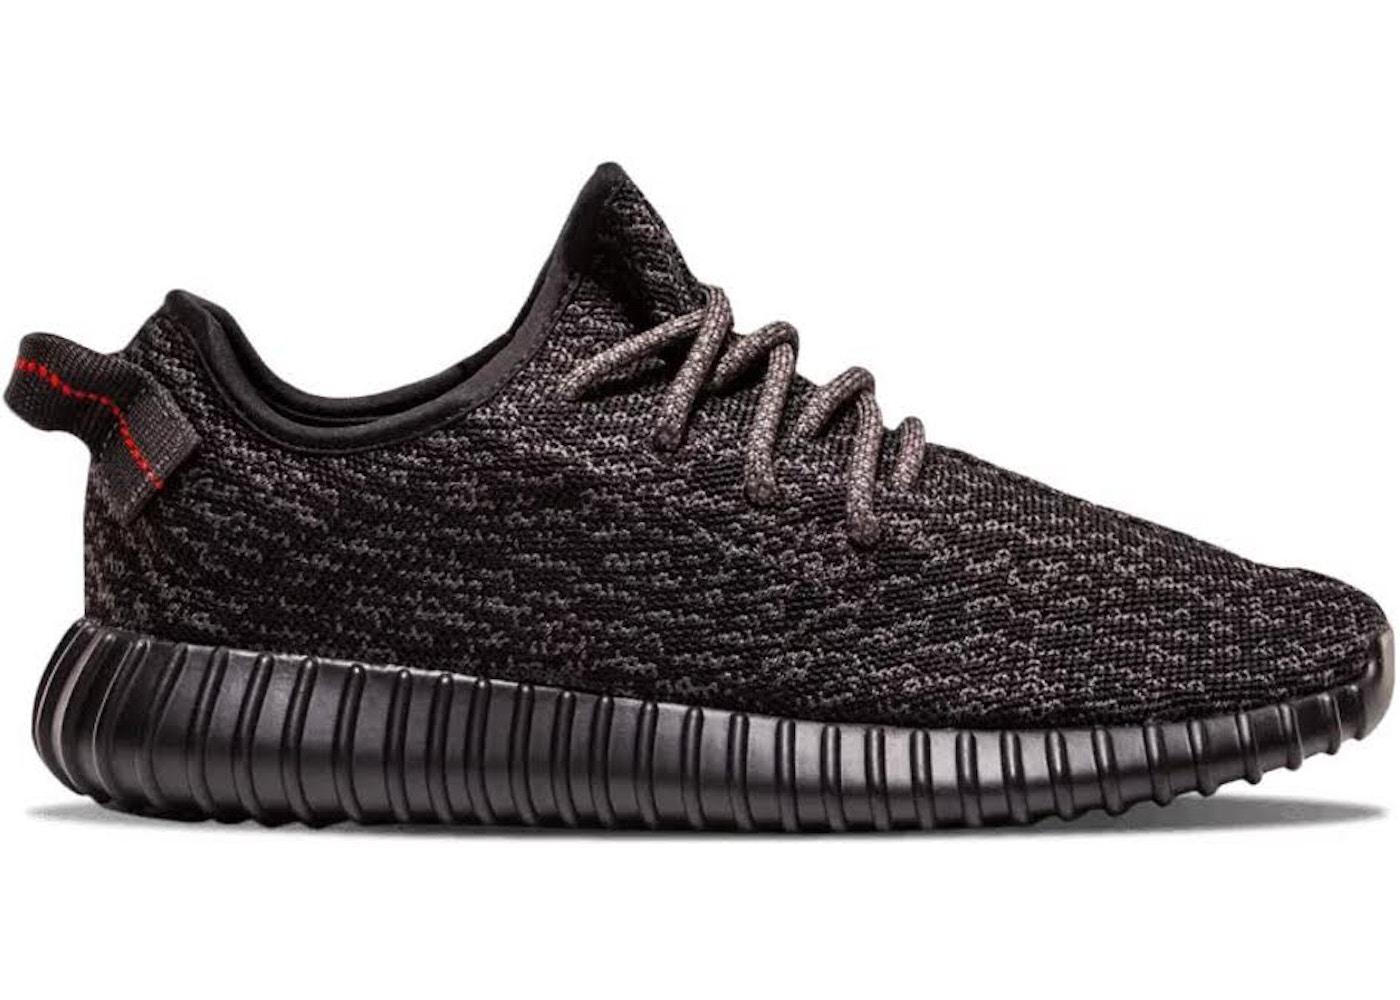 adidas Yeezy Boost 350 Pirate Black (2015) - AQ2659